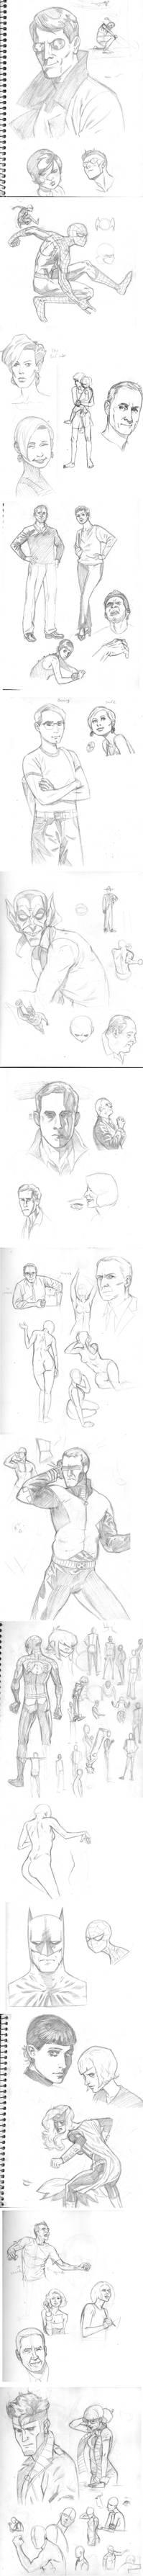 Sketchdump 29